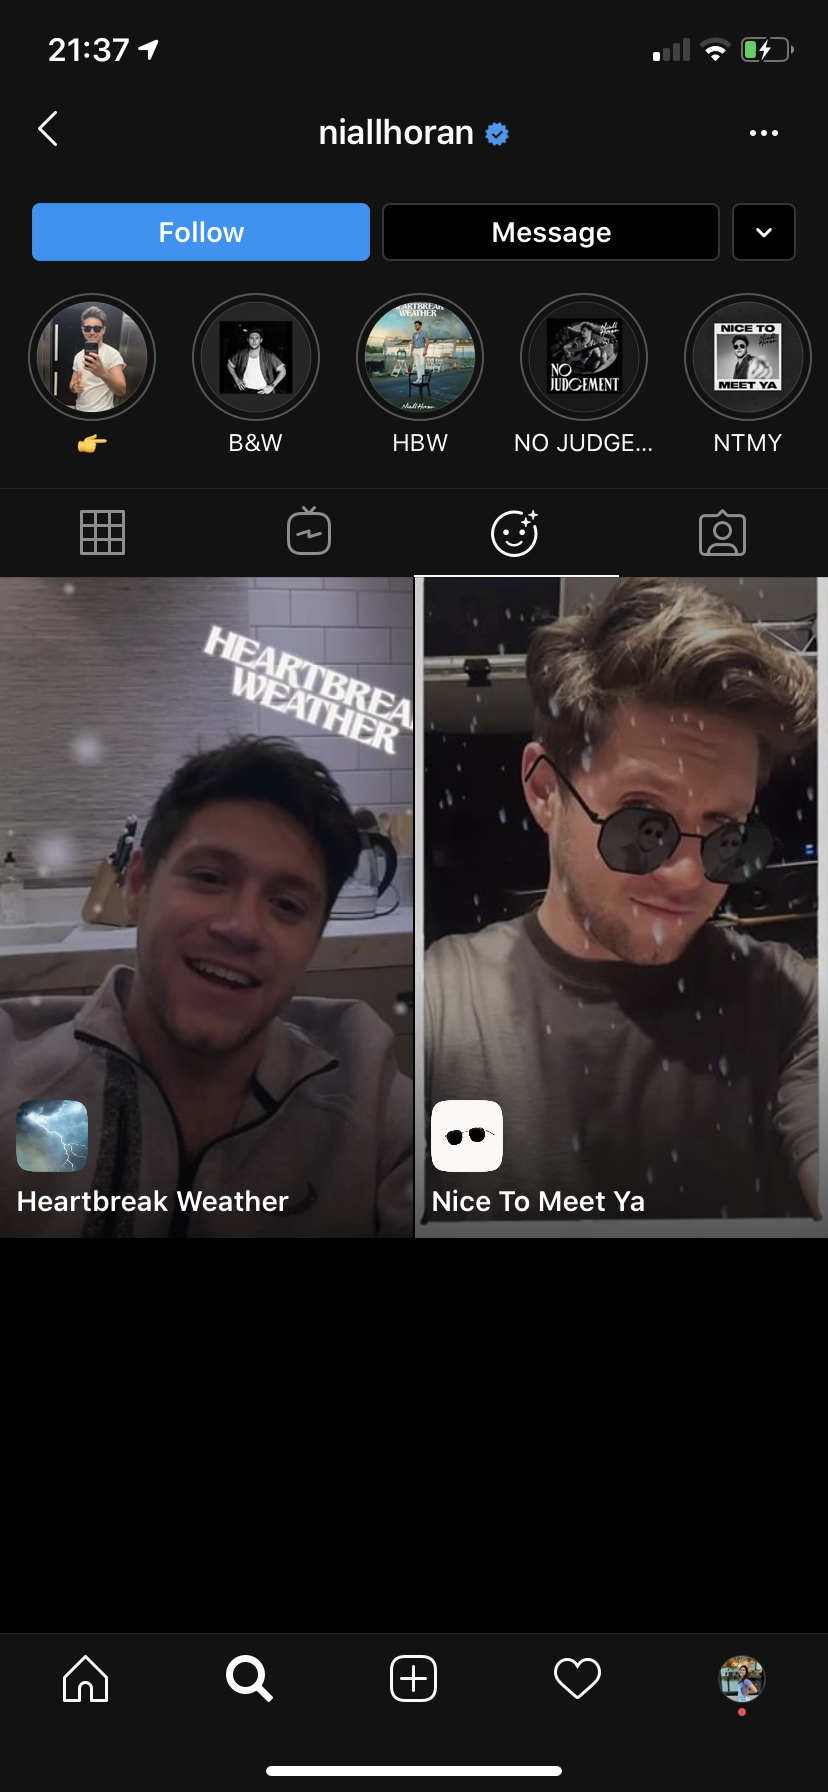 Niall Horan Instagram effects